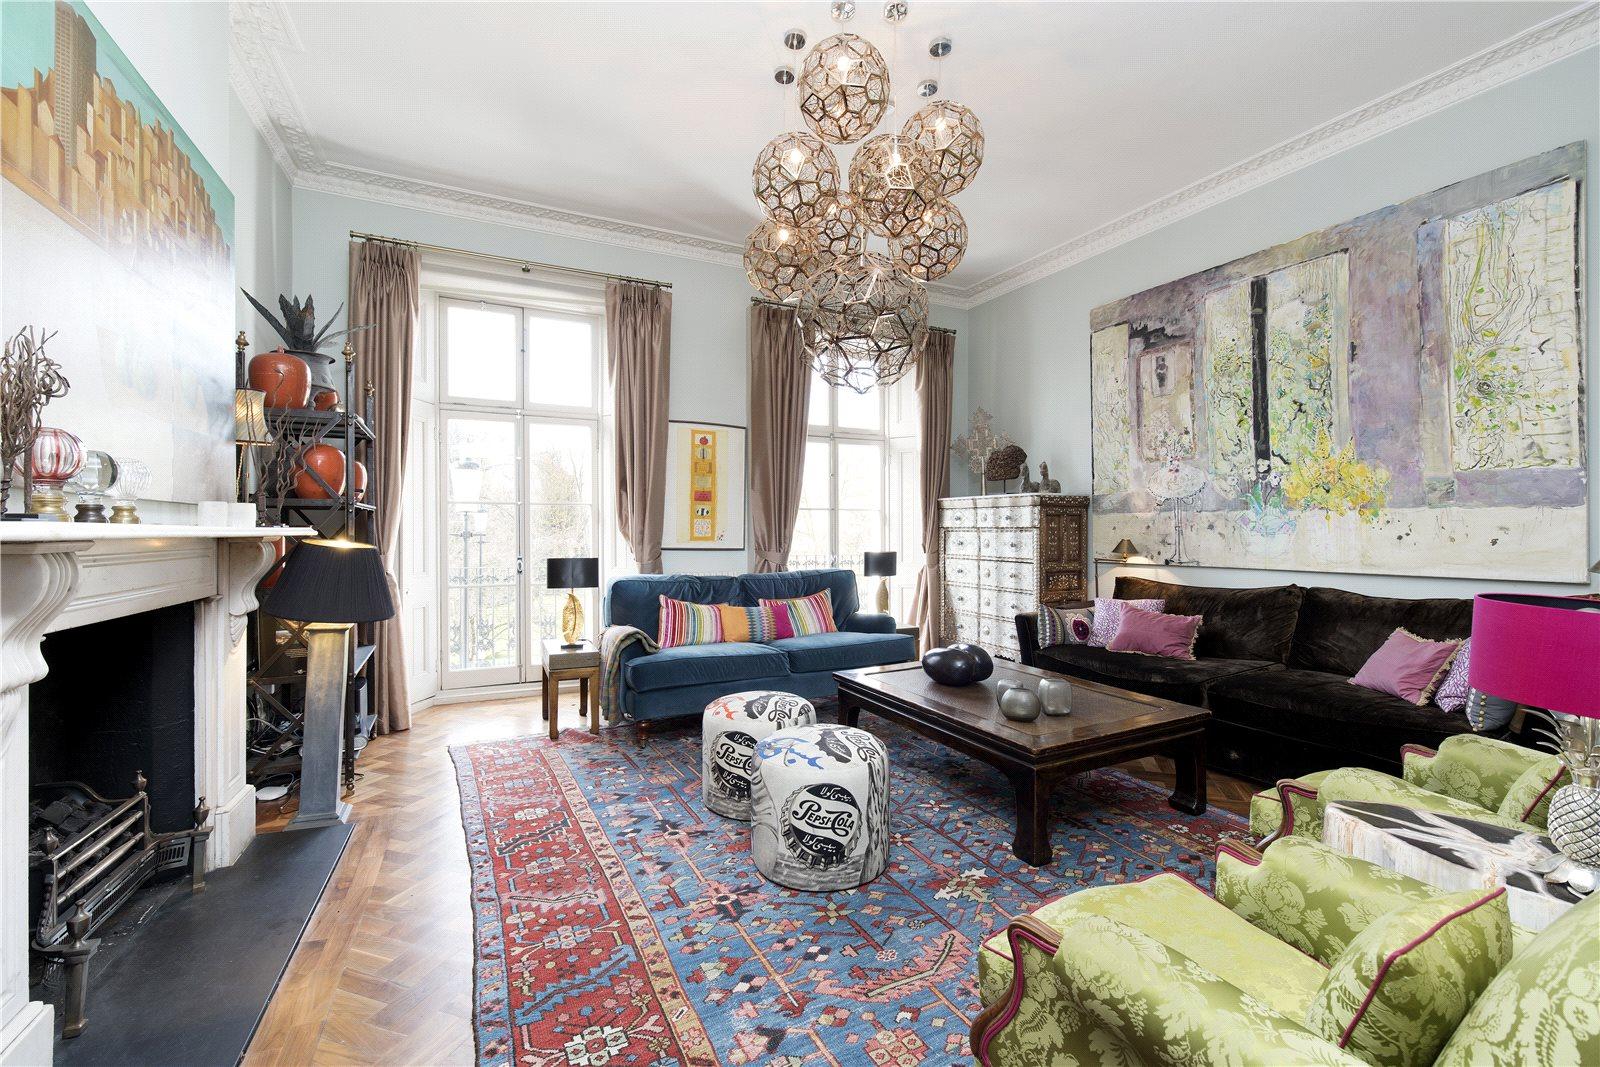 Частный дом для того Продажа на Royal Crescent, Holland Park, London, W11 Holland Park, London, Англия